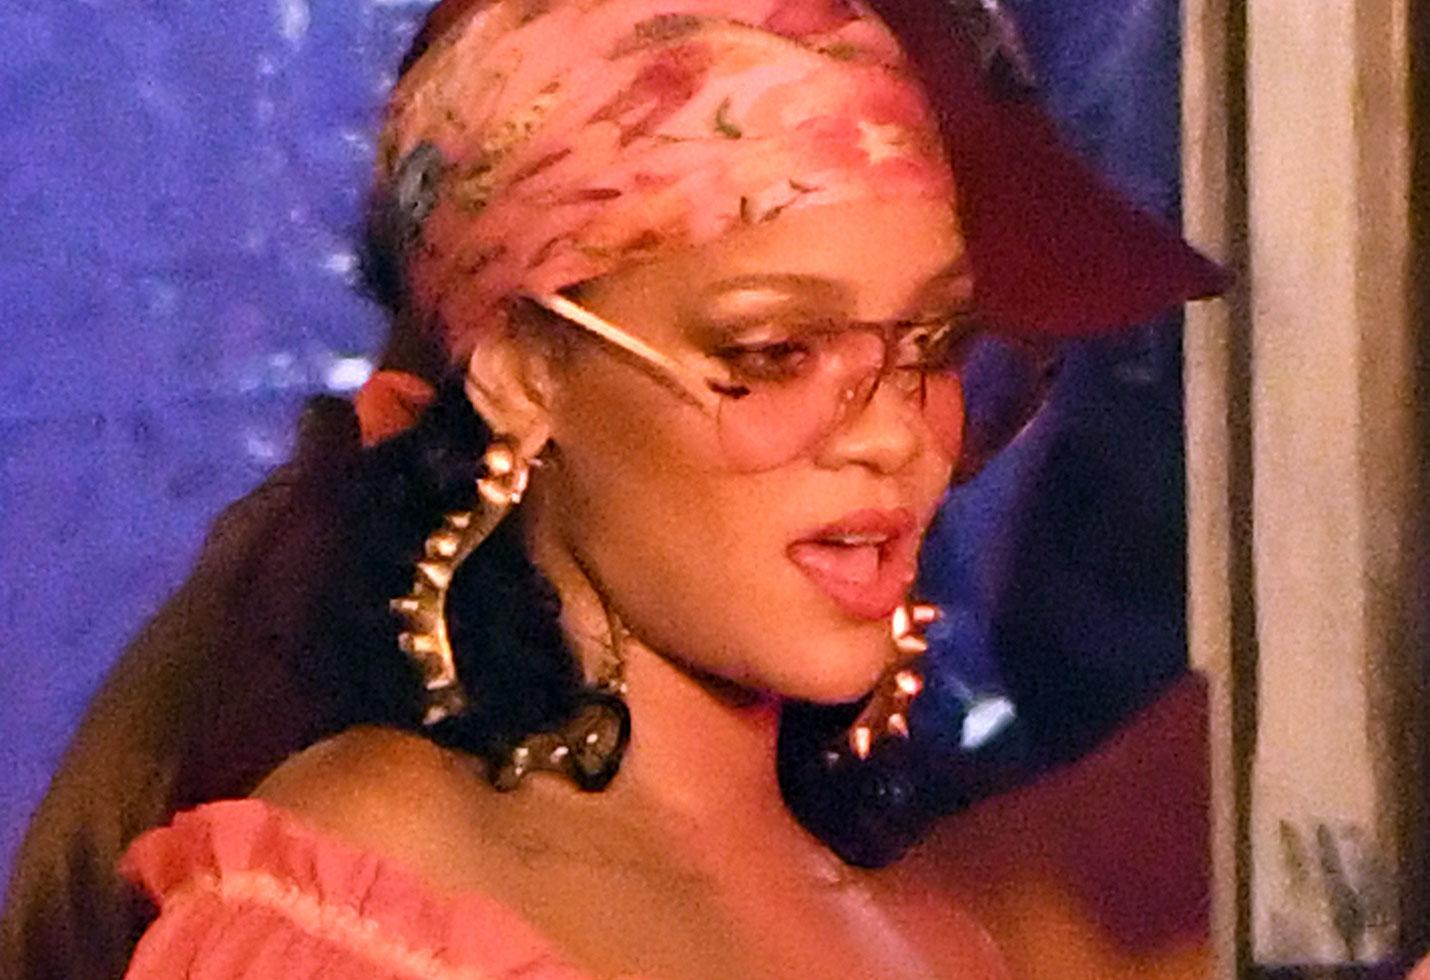 Rihanna exposes nipples sheer shirt music video